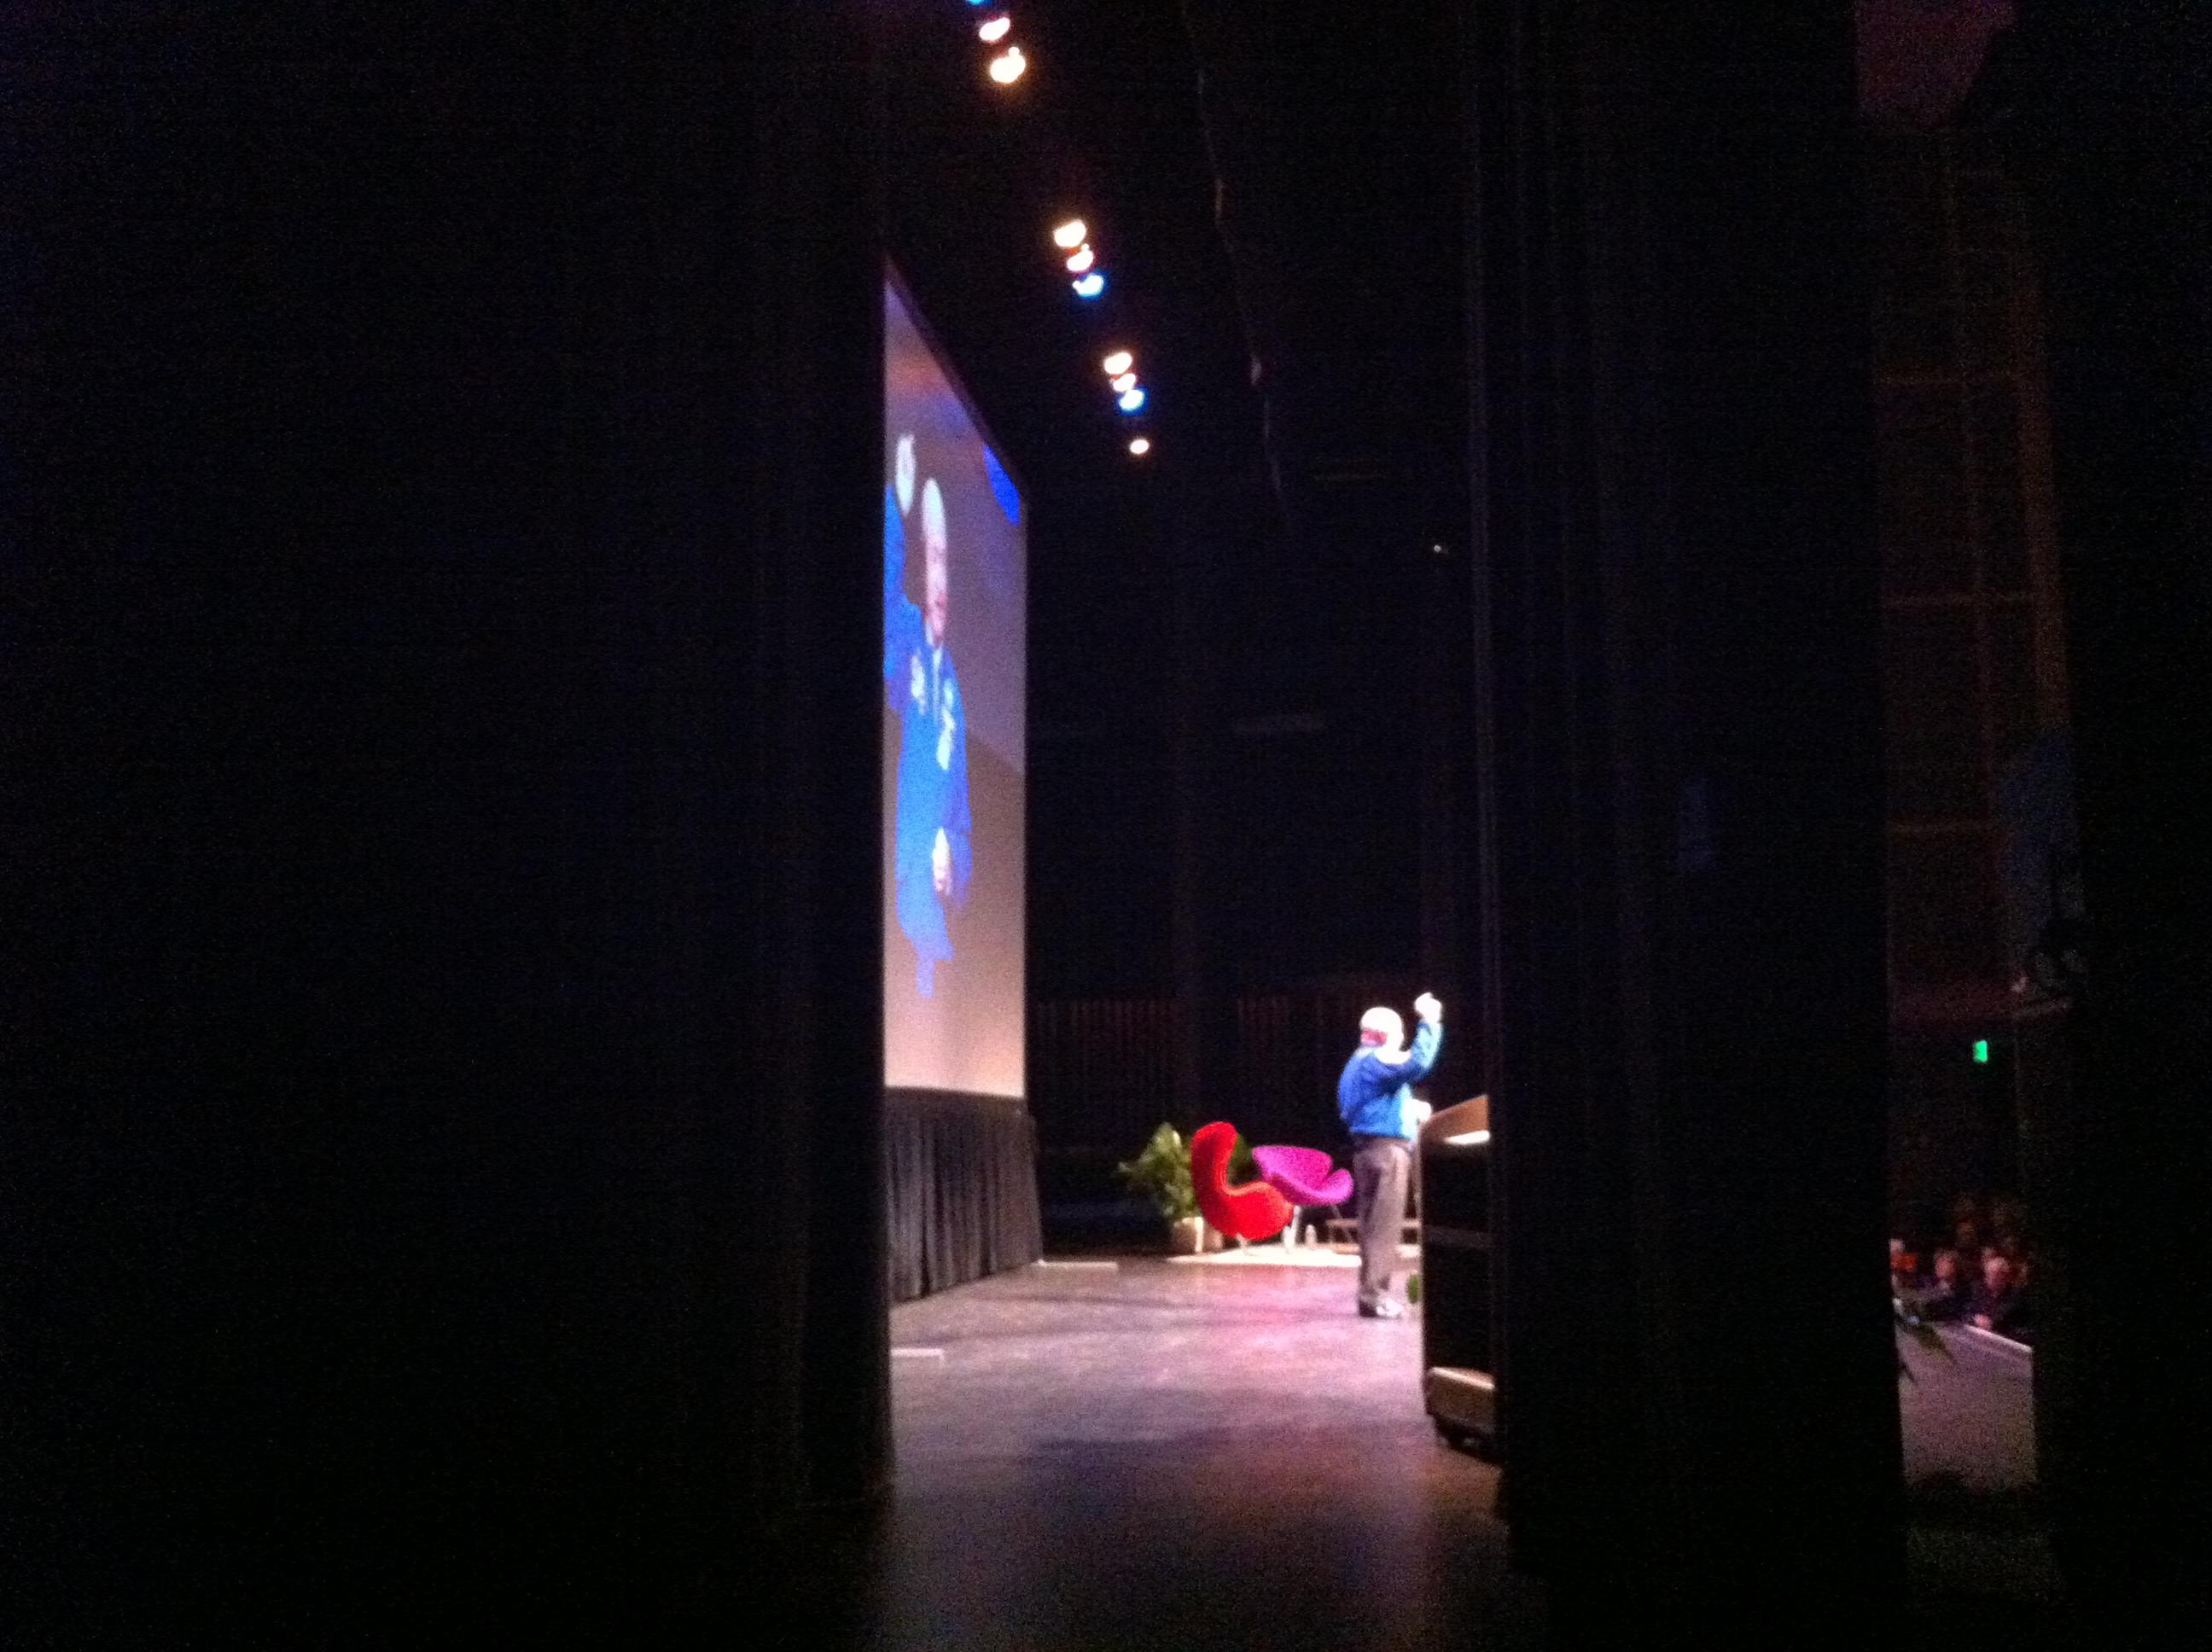 Capt. Mark Kelly Inspires Sarasota Audience